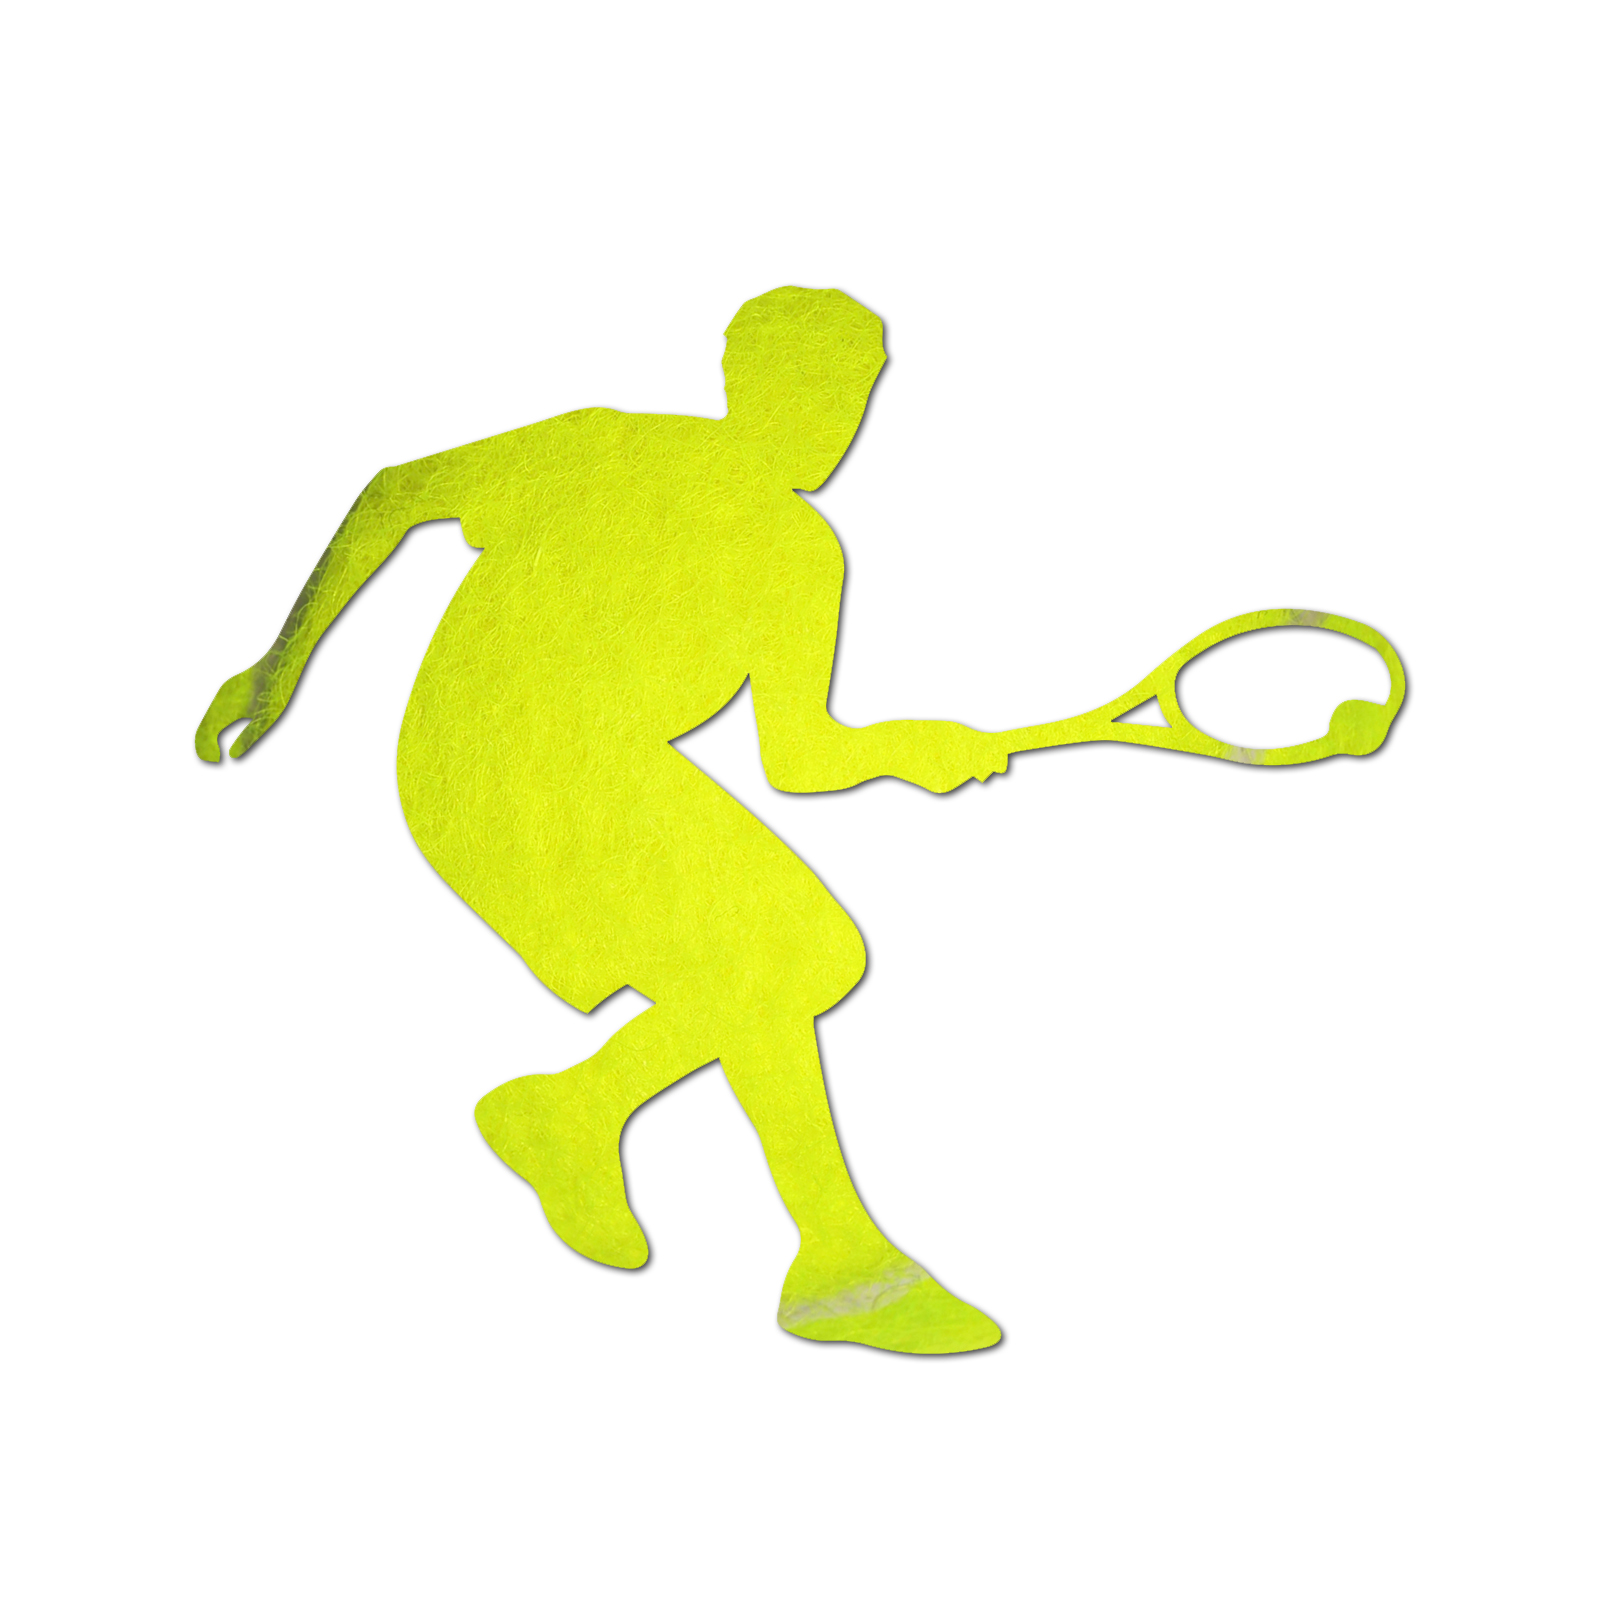 1600x1600 Tennis Player Silhouette Color Vinyl Sports Car Laptop Sticker